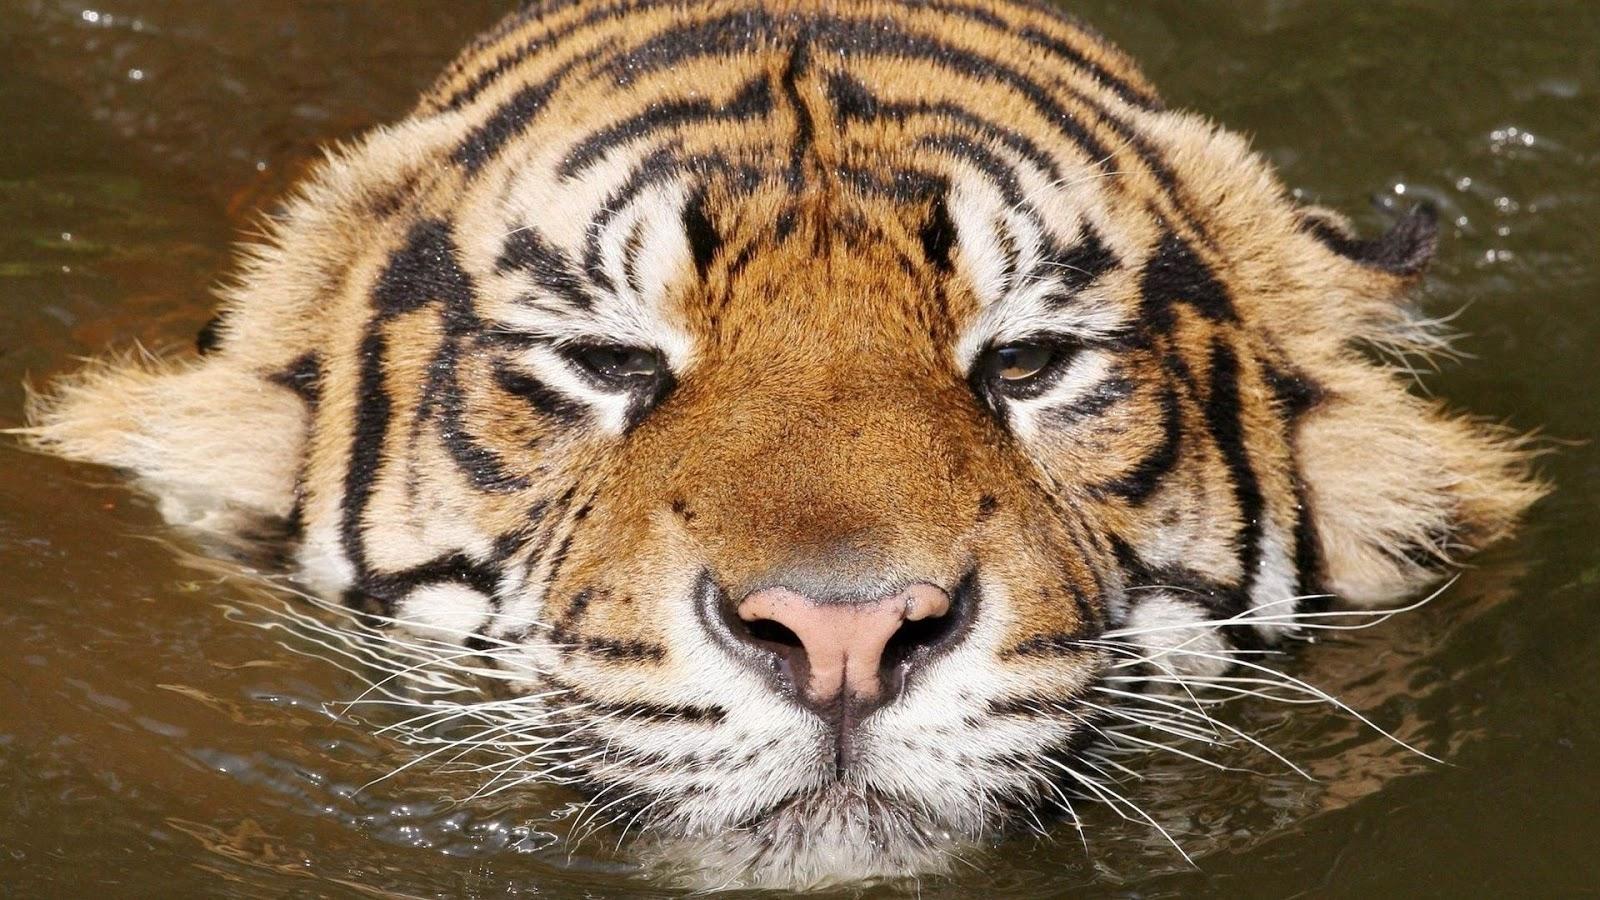 Imagenes De Tigres Para Fondo De Pantalla Hd